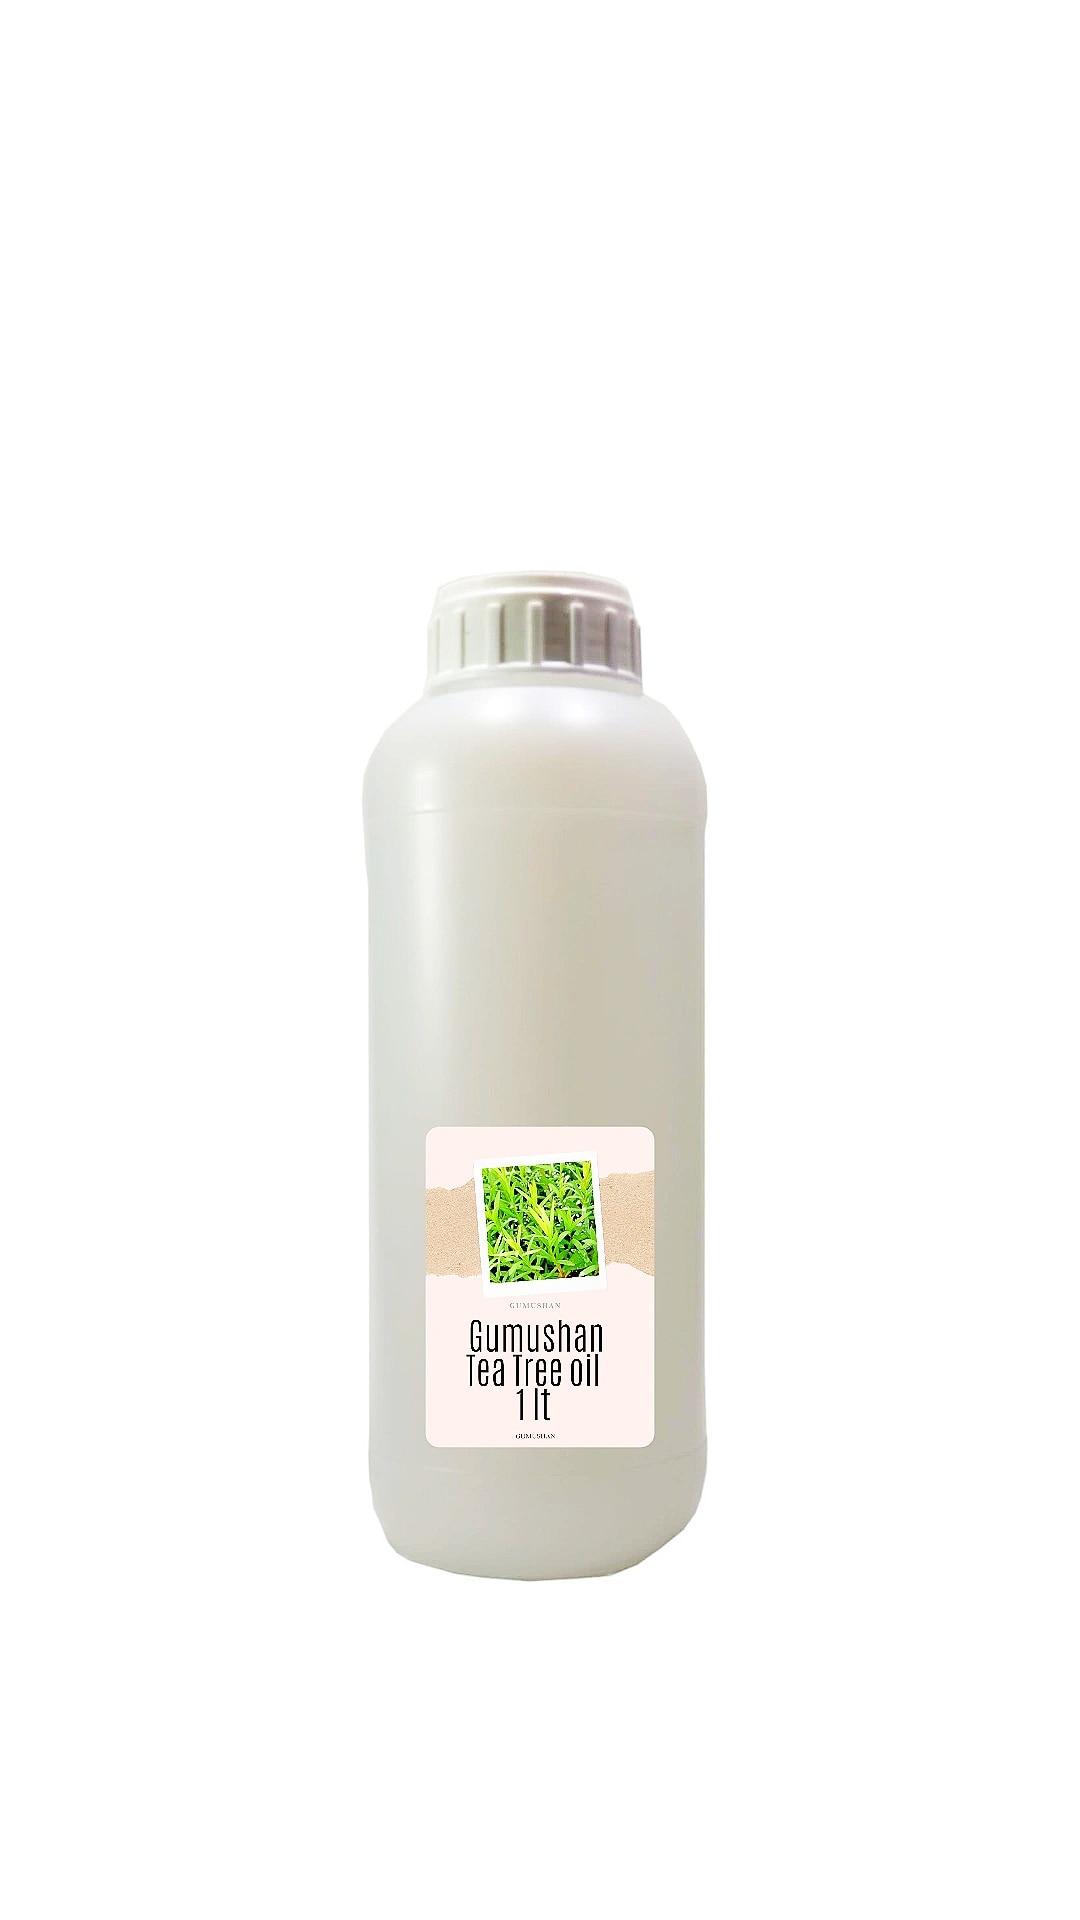 High quality pure Tea Tree Oil 1 liter 34 fl oz 1000ml